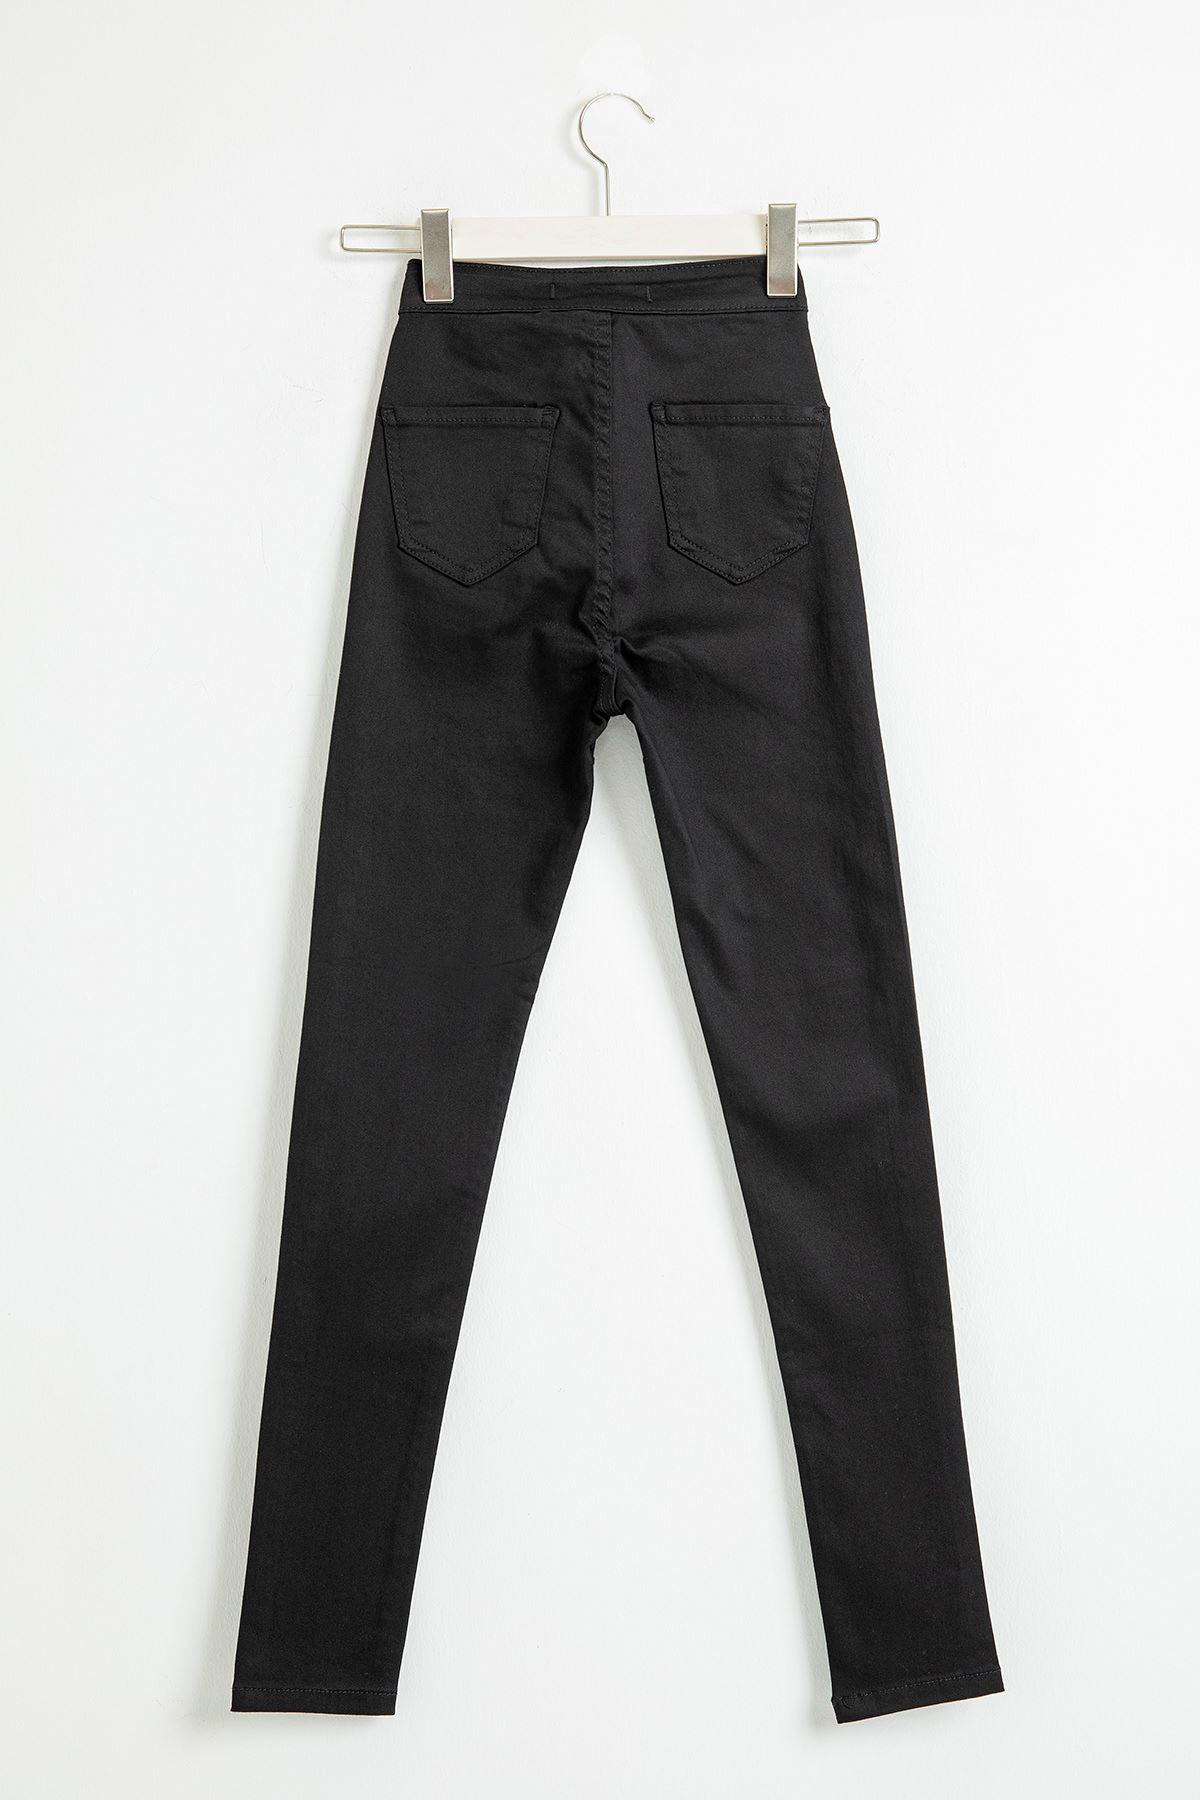 Cepsiz Skinny Jean Pantolon-Siyah